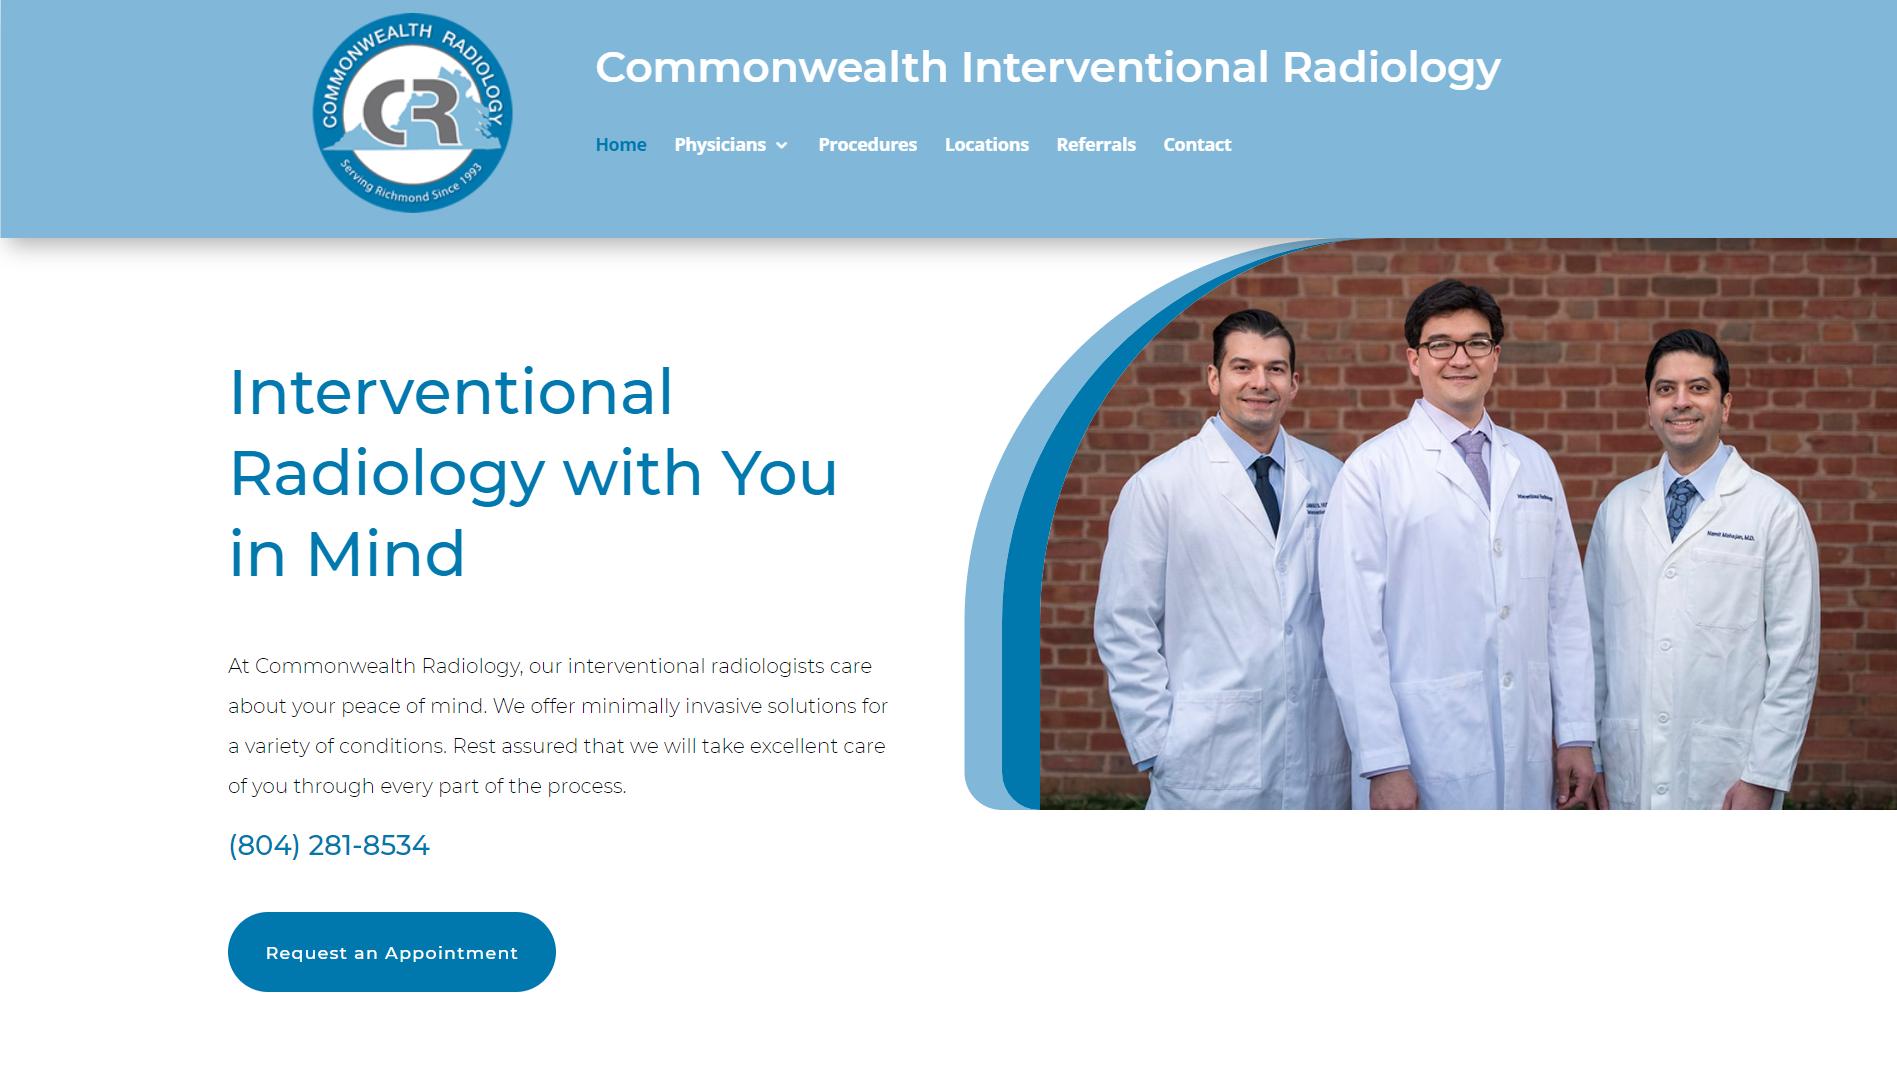 Commonwealth Interventional Radiology Screenshot